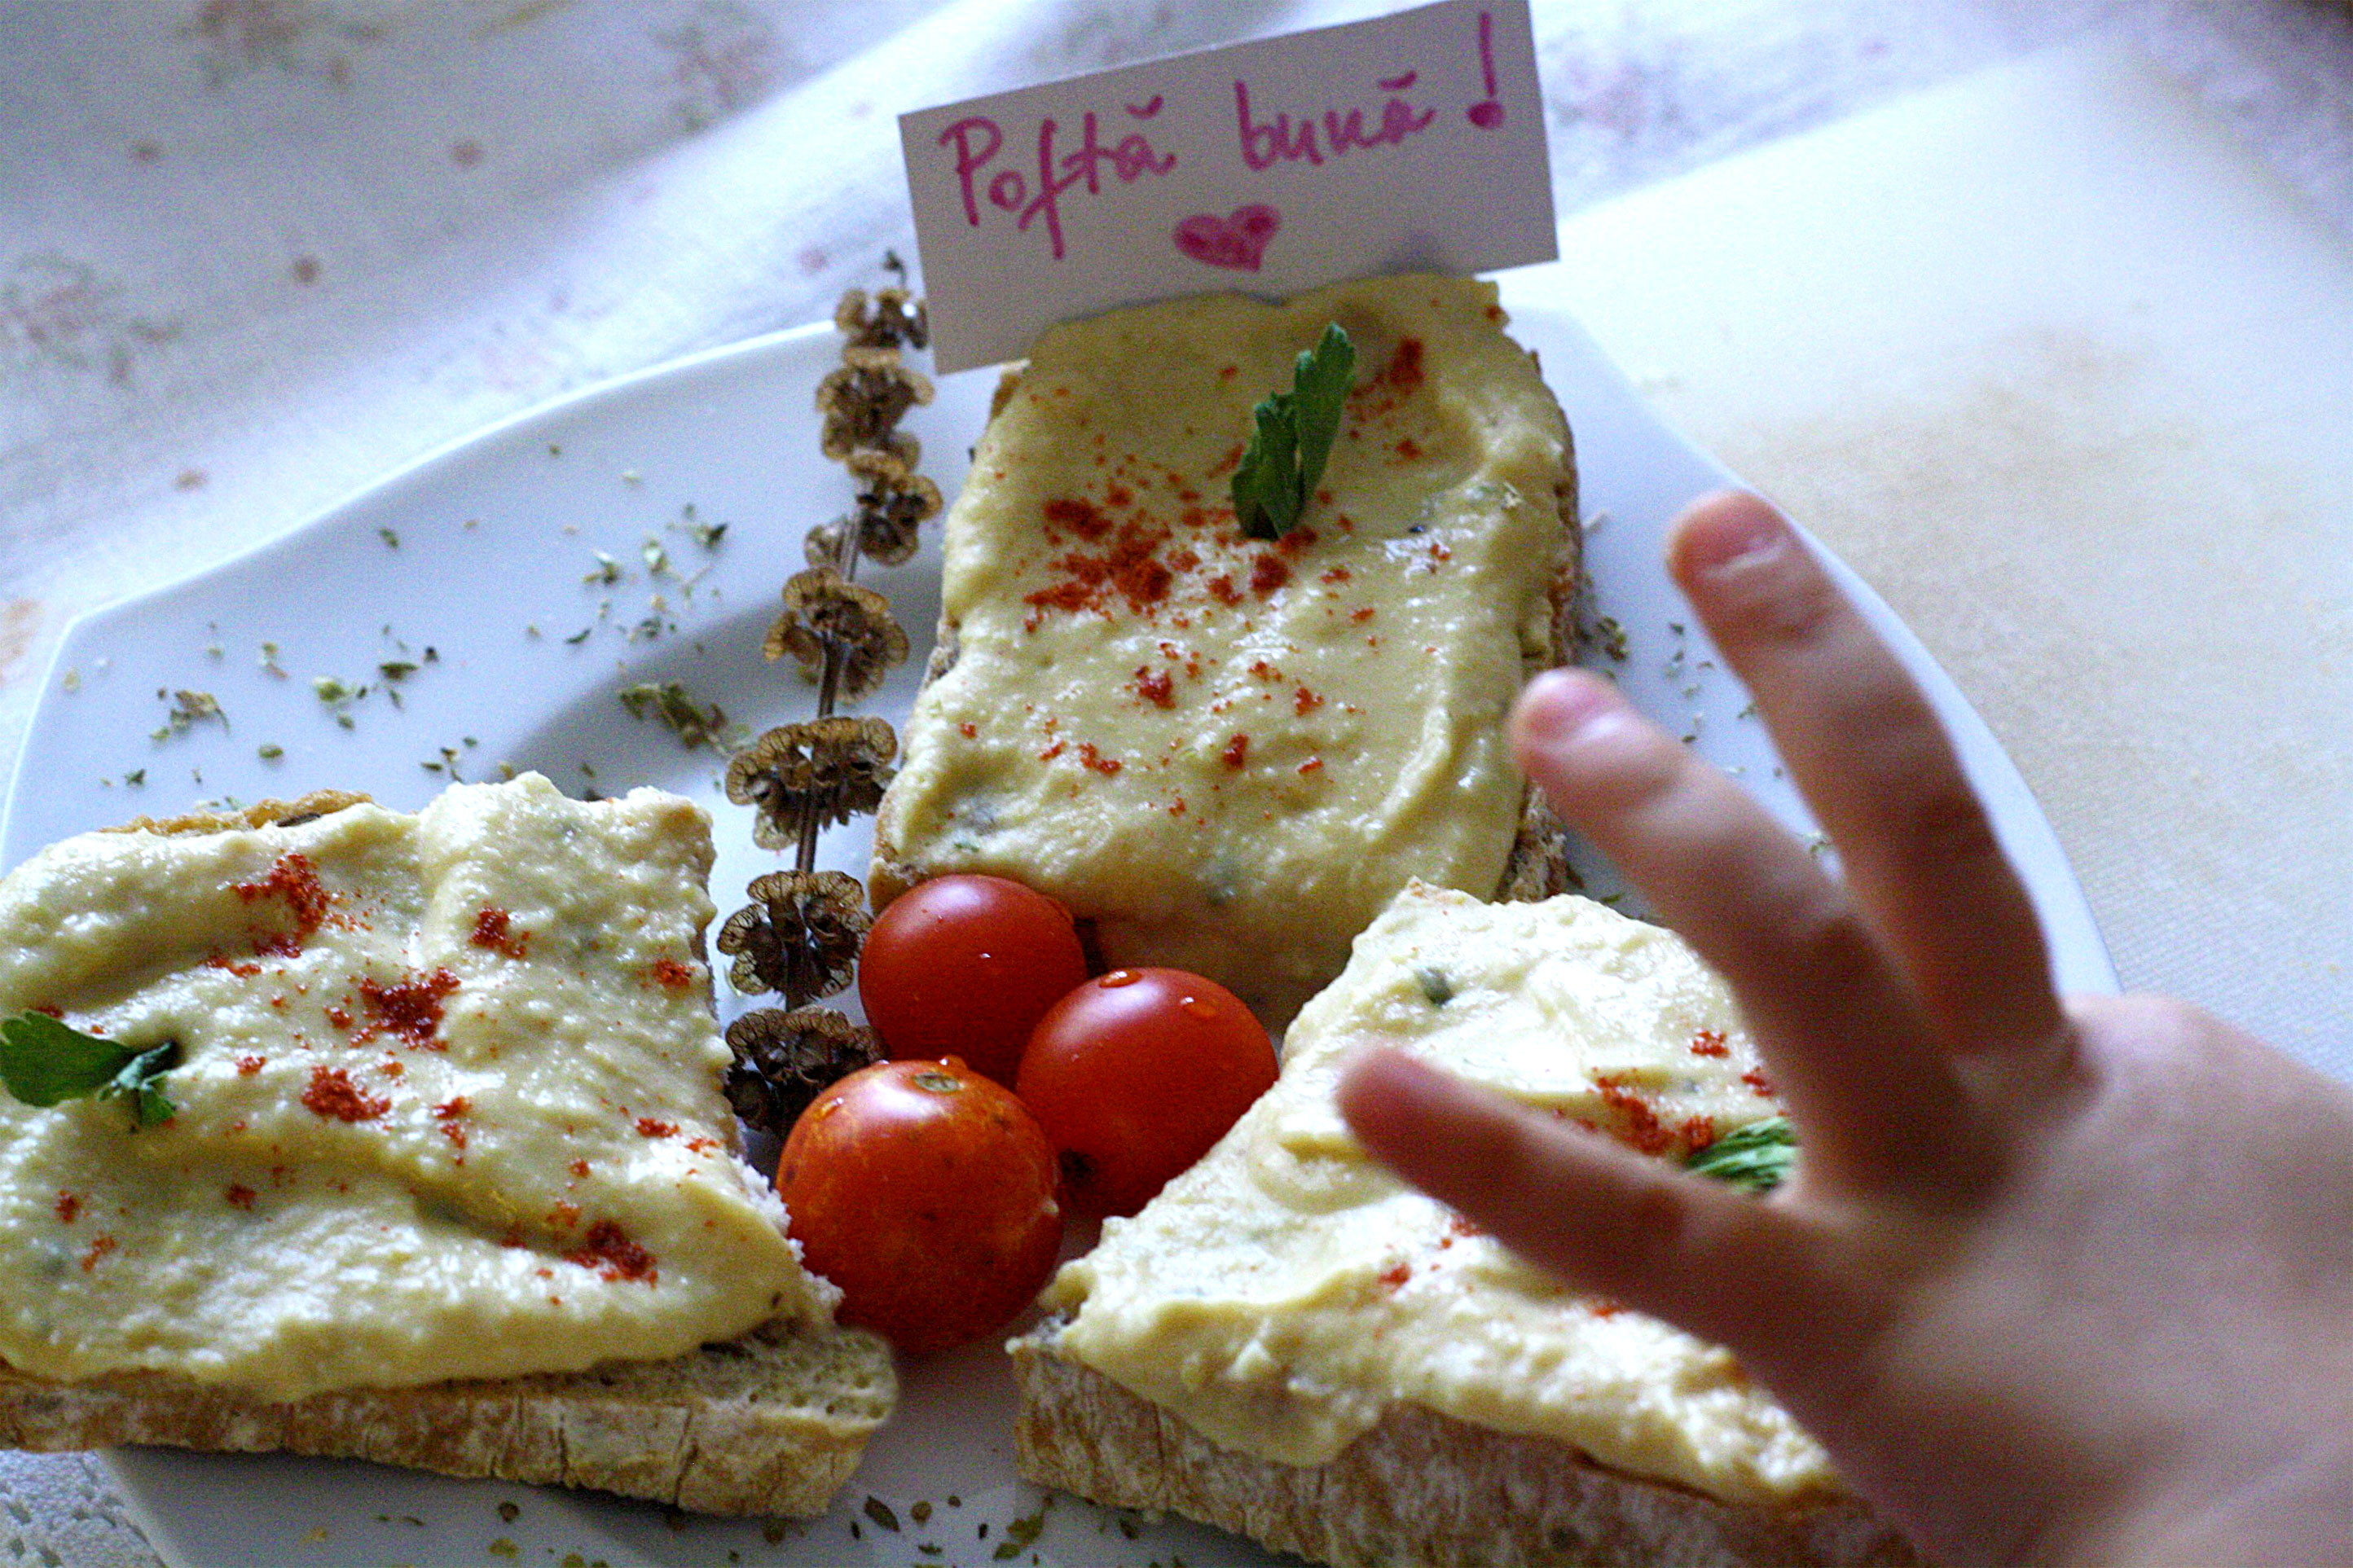 Cel-mai-bun-hummus-Nutricios-